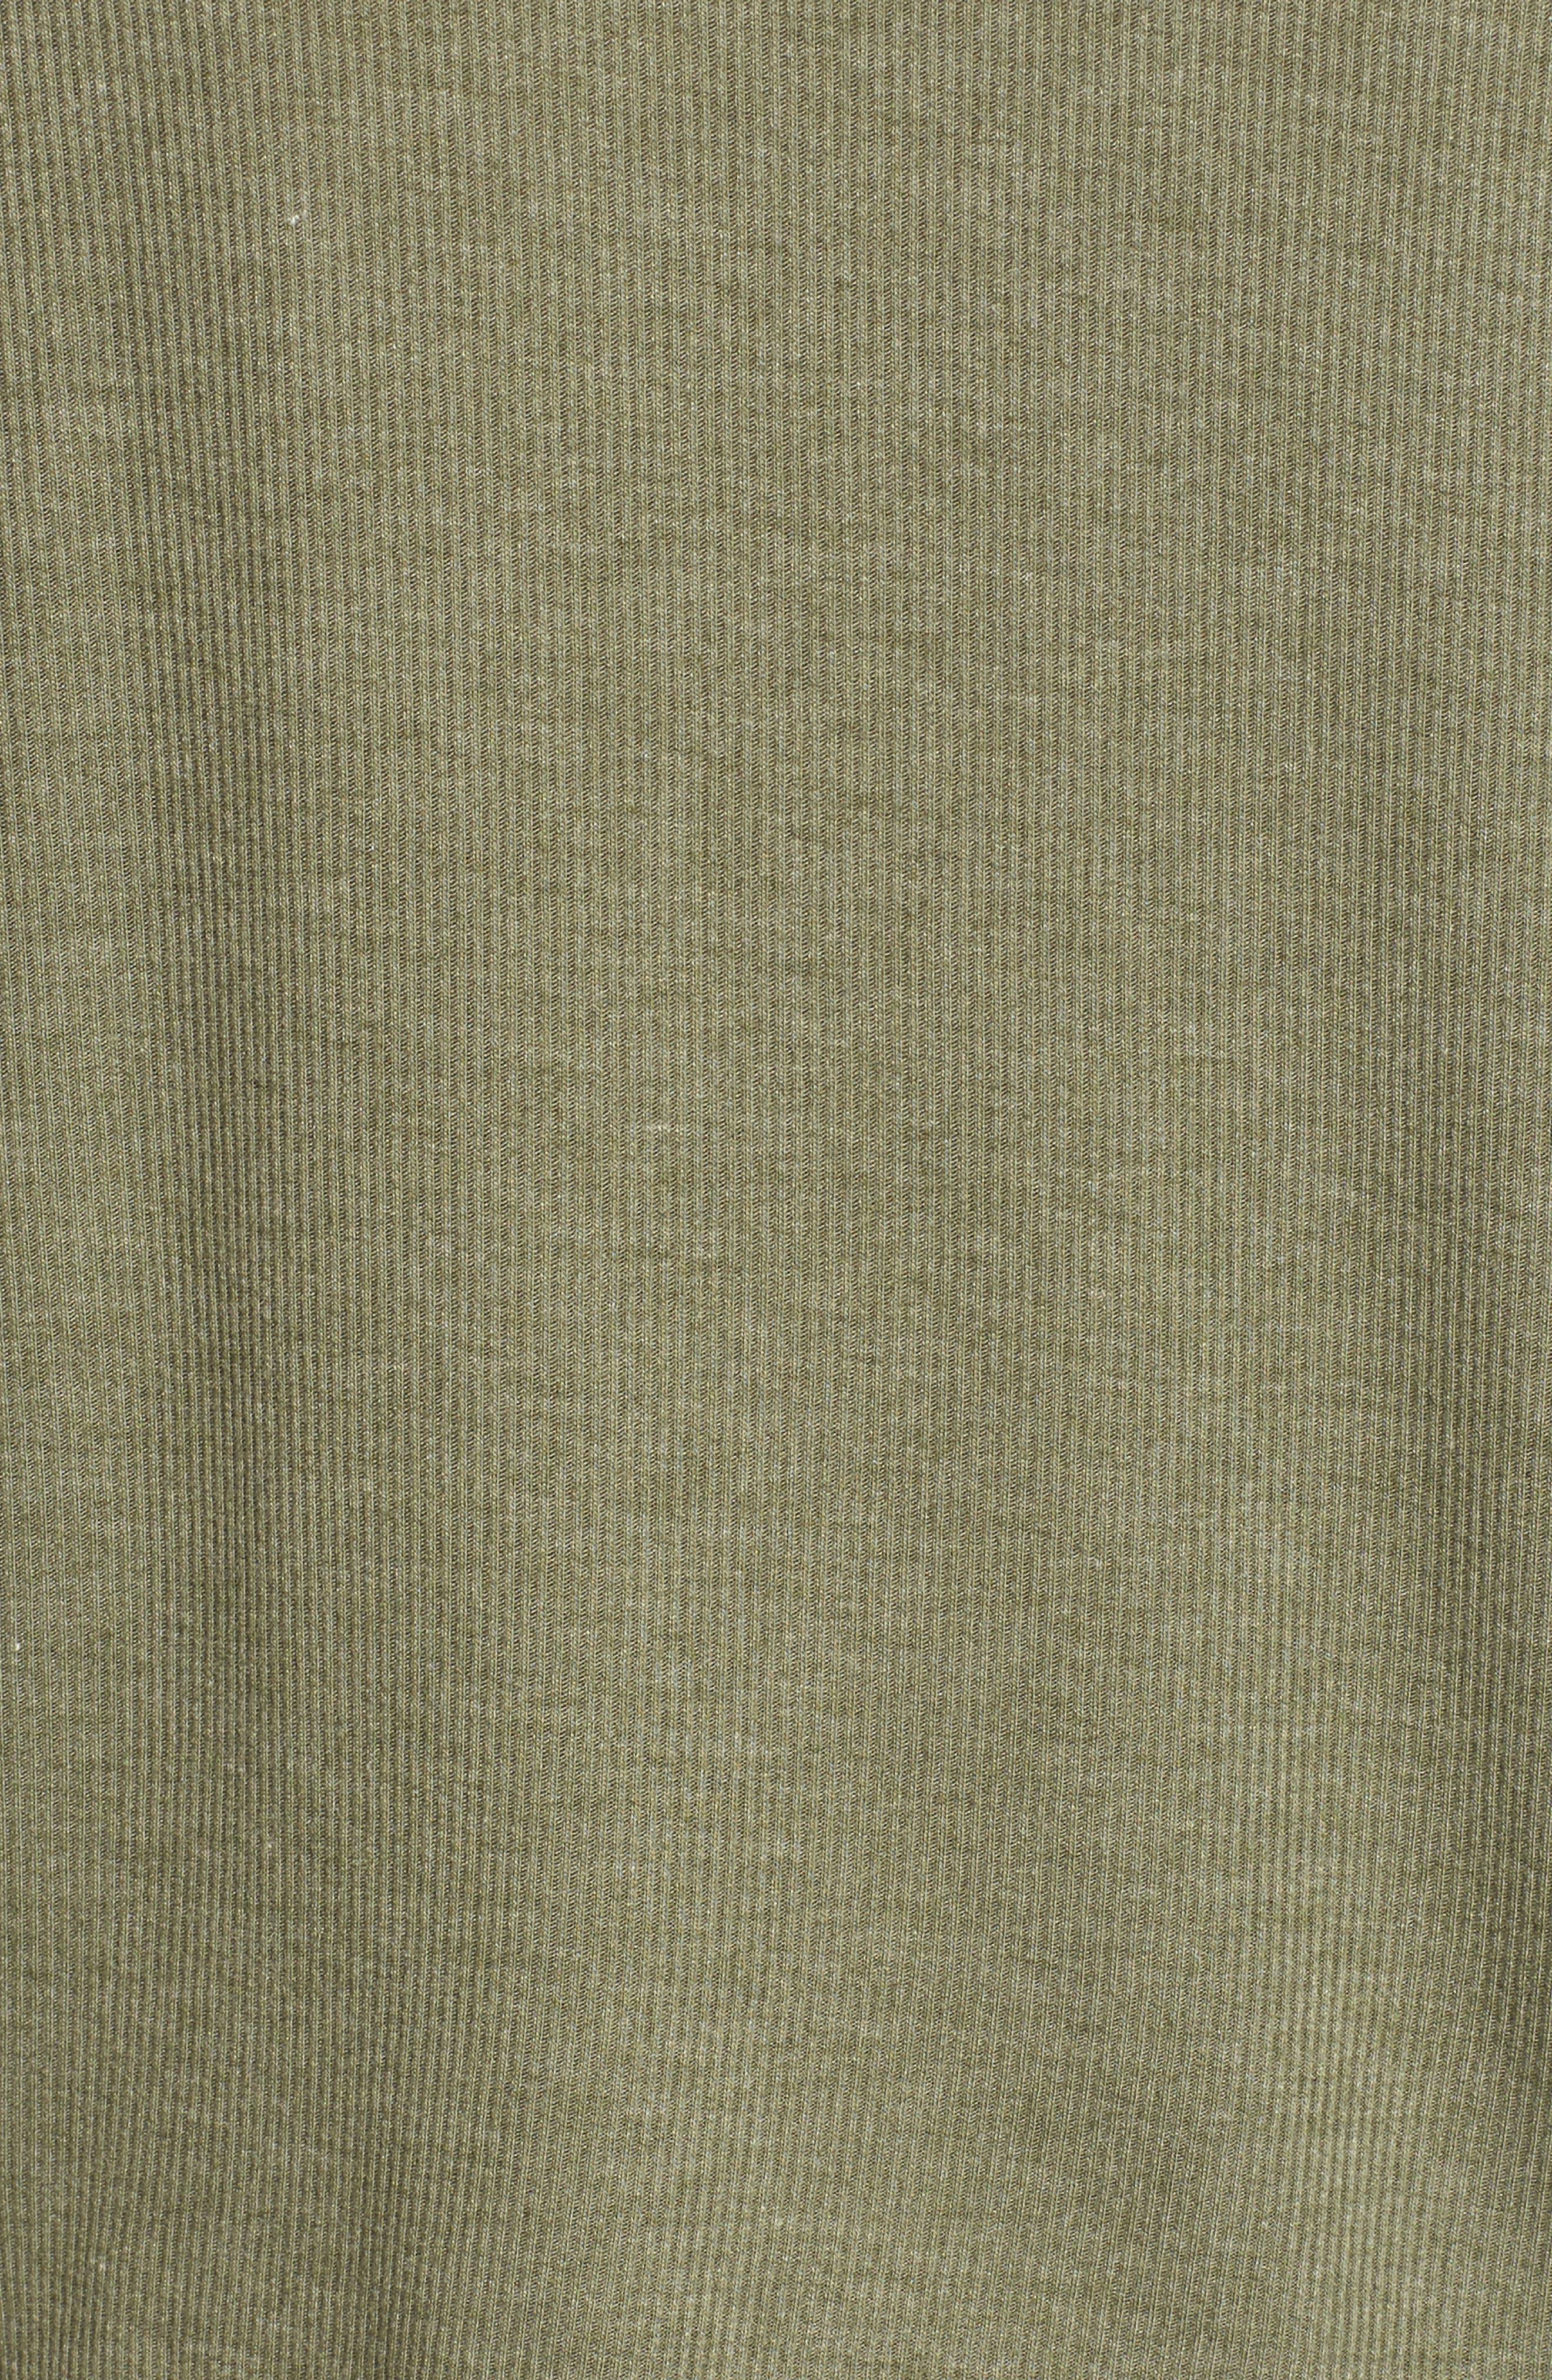 Balloon Sleeve Sweater,                             Alternate thumbnail 5, color,                             341